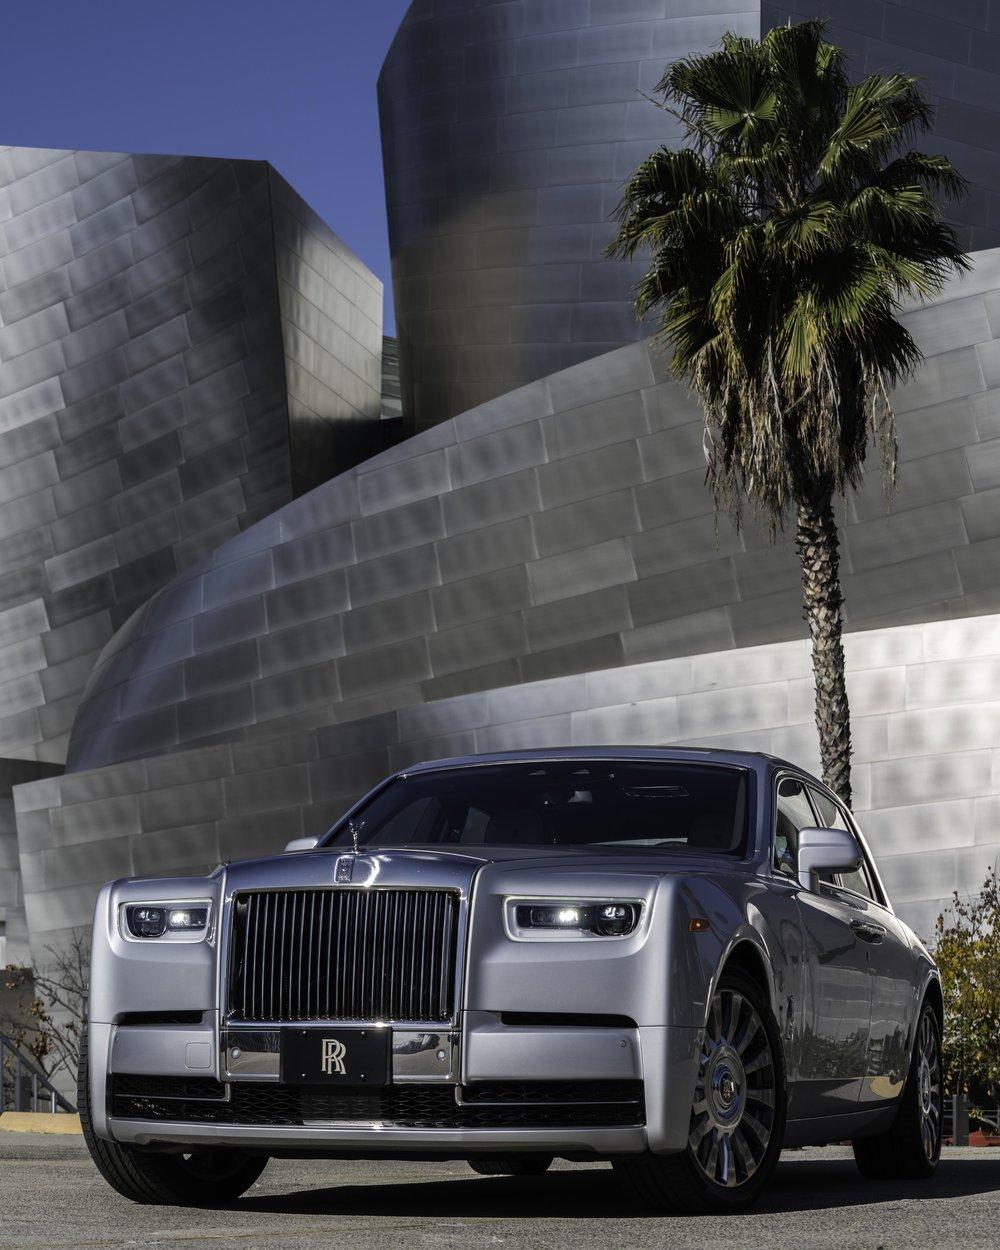 Rolls-Royce Phantom at Disney Concert Hall, LA